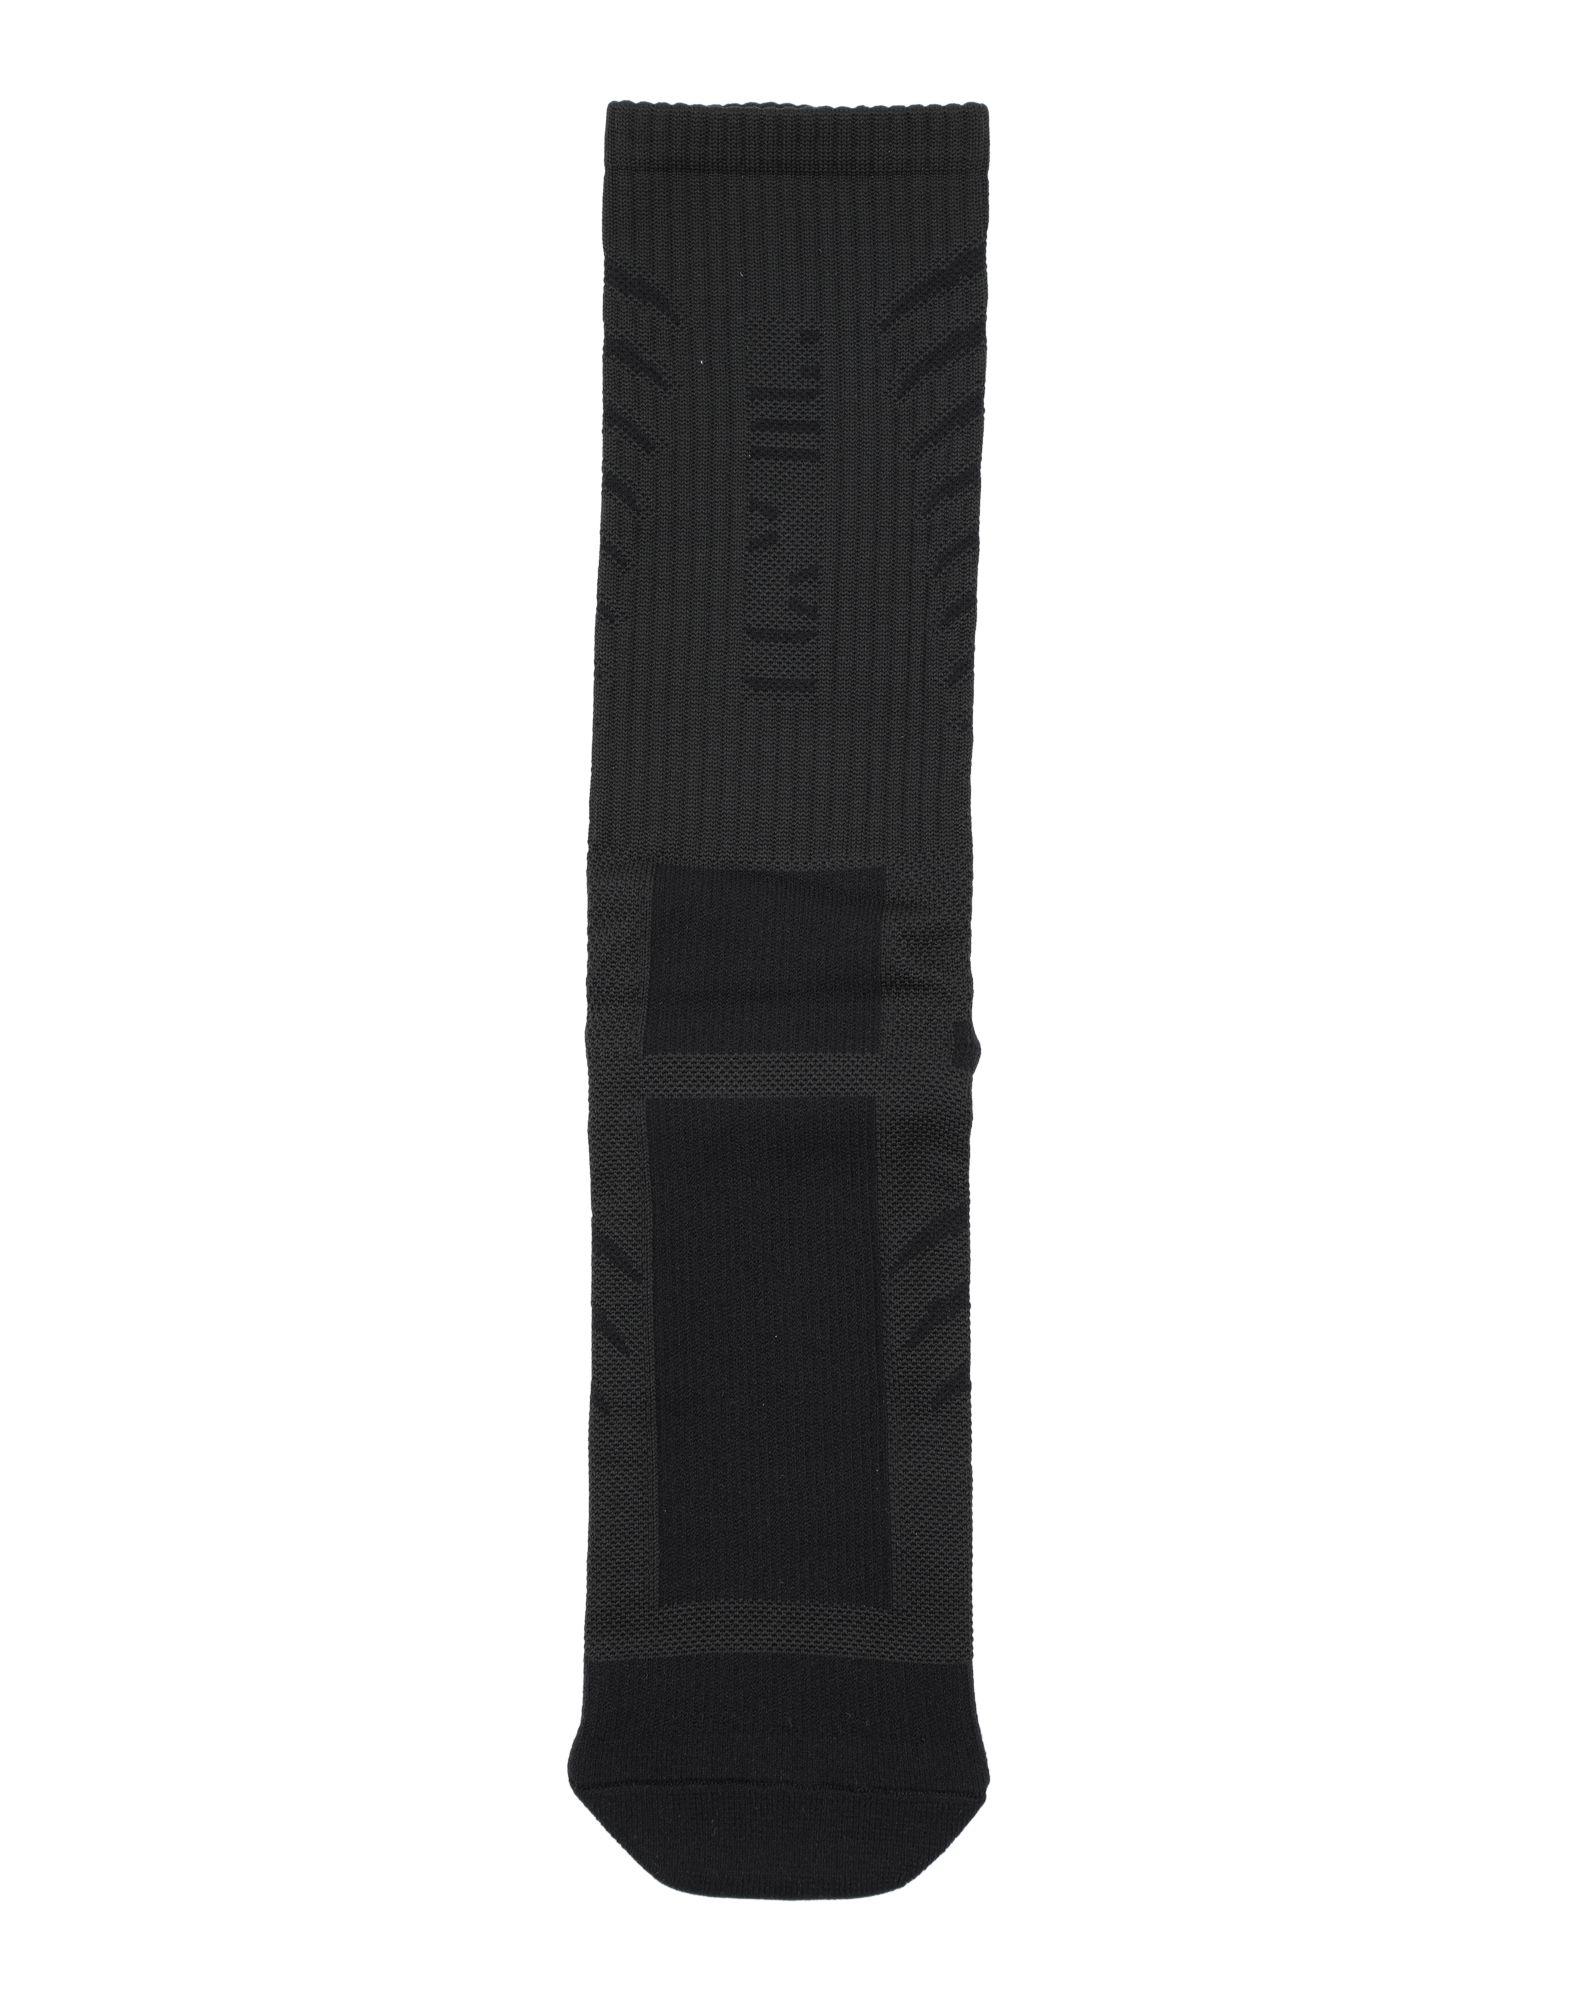 BEN TAVERNITI™ UNRAVEL PROJECT Короткие носки ben taverniti™ unravel project короткие носки